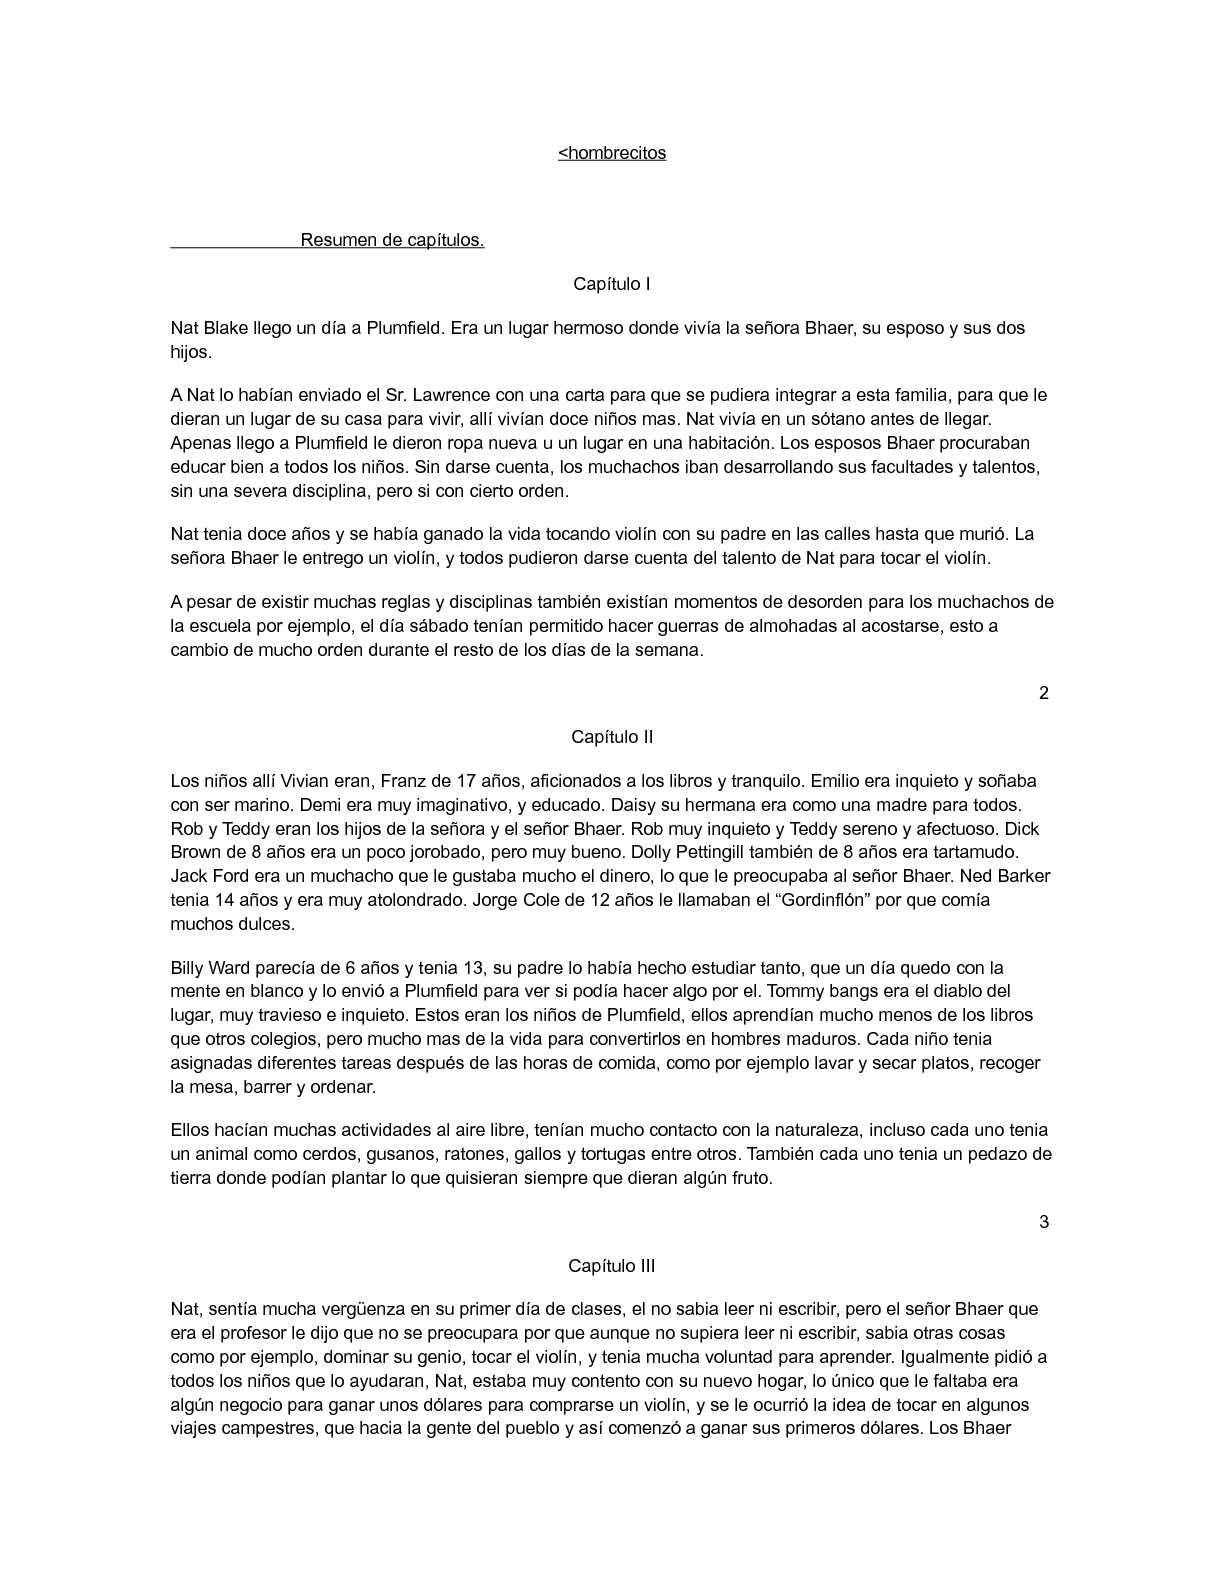 Calaméo - libro hombrecitos resumen